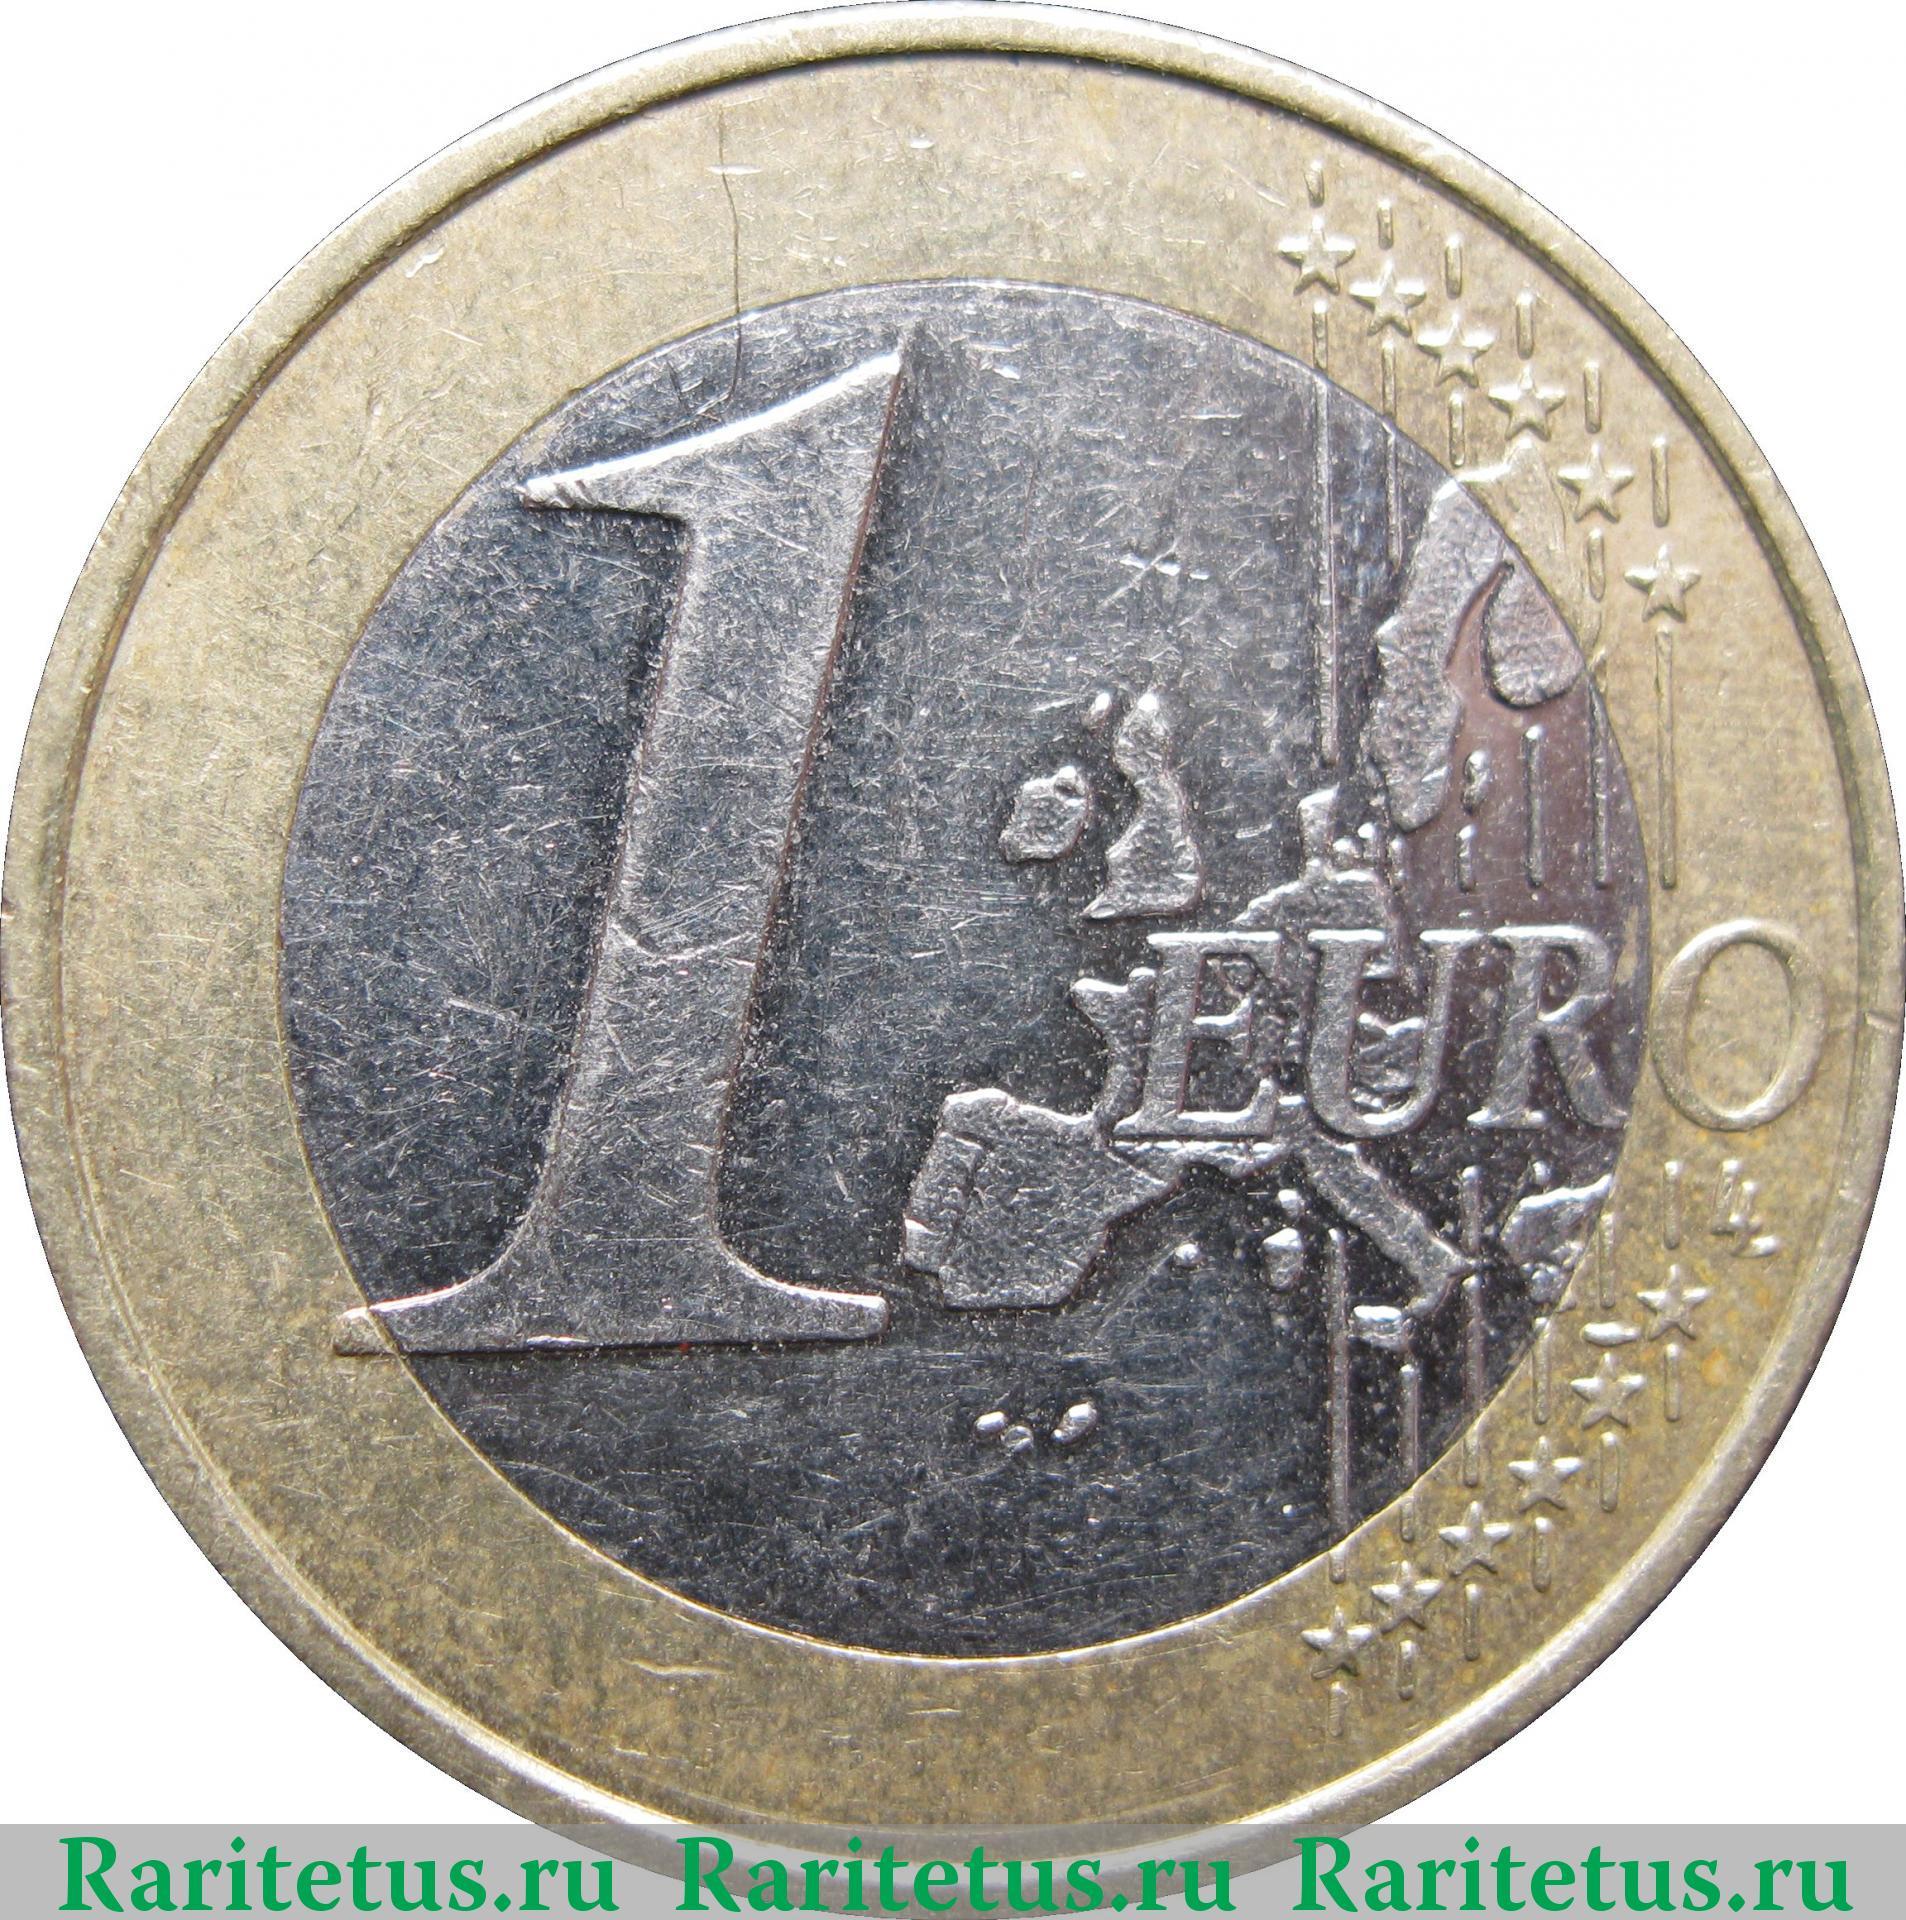 цена монеты 5 zkotych rzeczpospolita 1934 г в